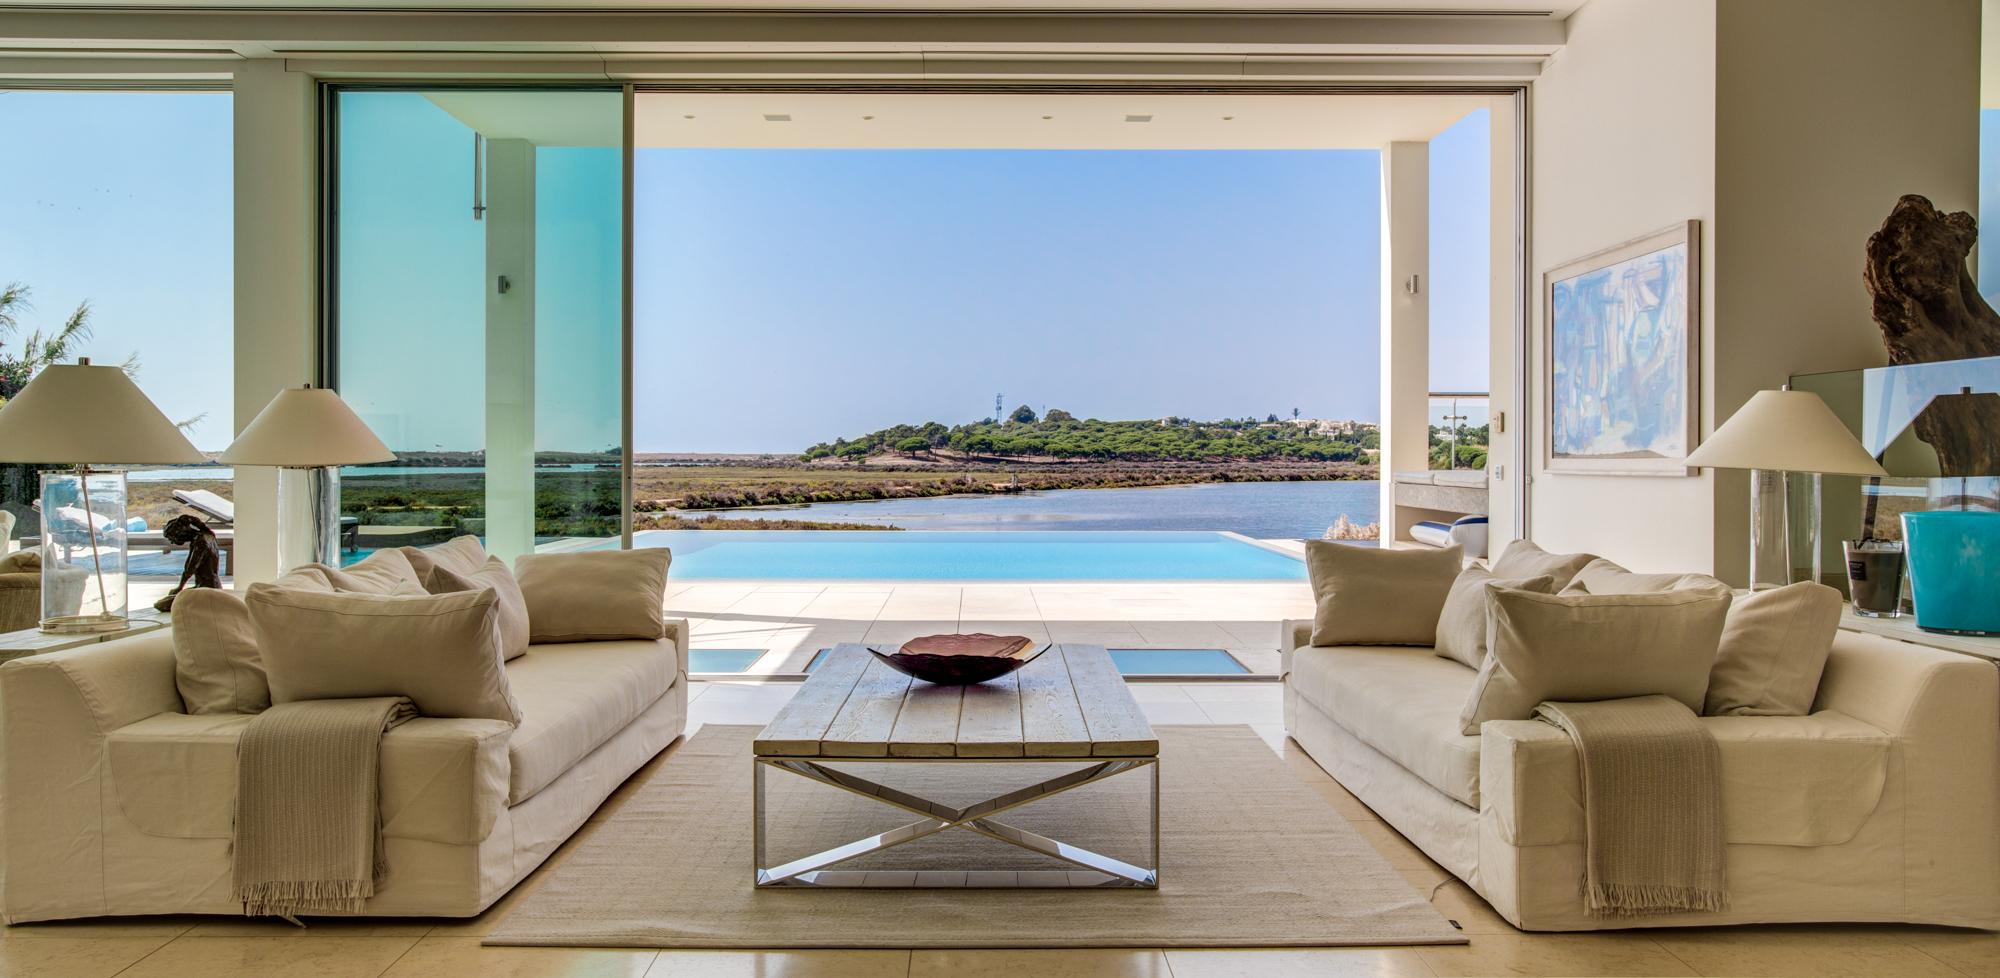 Villa Moon Sone, 5 bedroom prestige villa in Quinta do Lago, Algarve,lounge 4.jpg